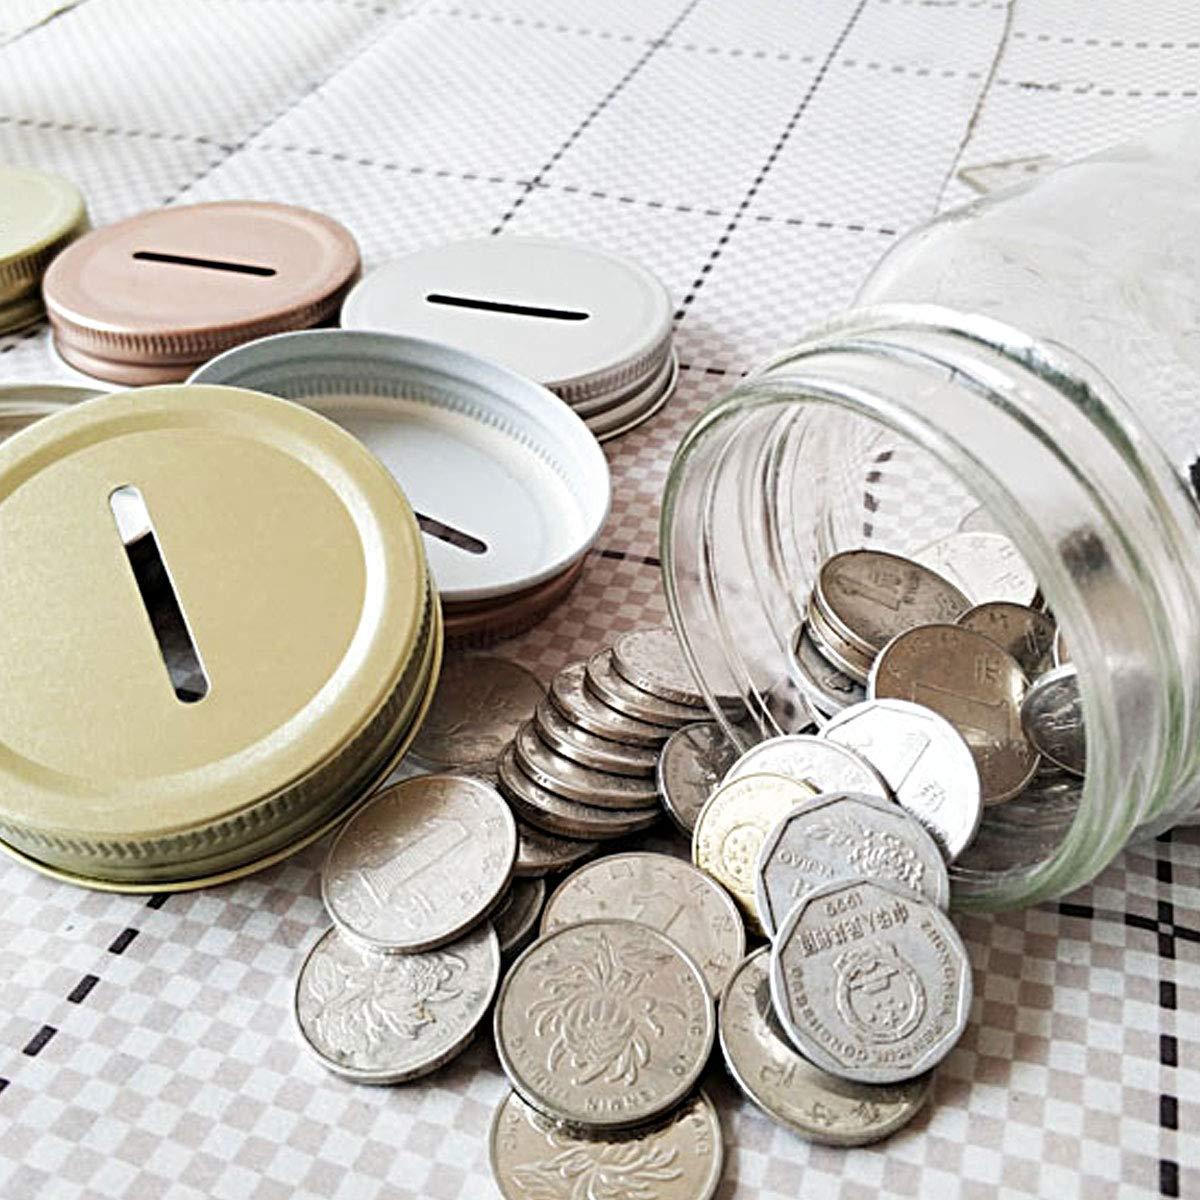 TiaoBug 8 Pieces Metal Coin Slot Bank Lids for Mason Jar Ball Canning Jars Silver One Size by TiaoBug (Image #2)